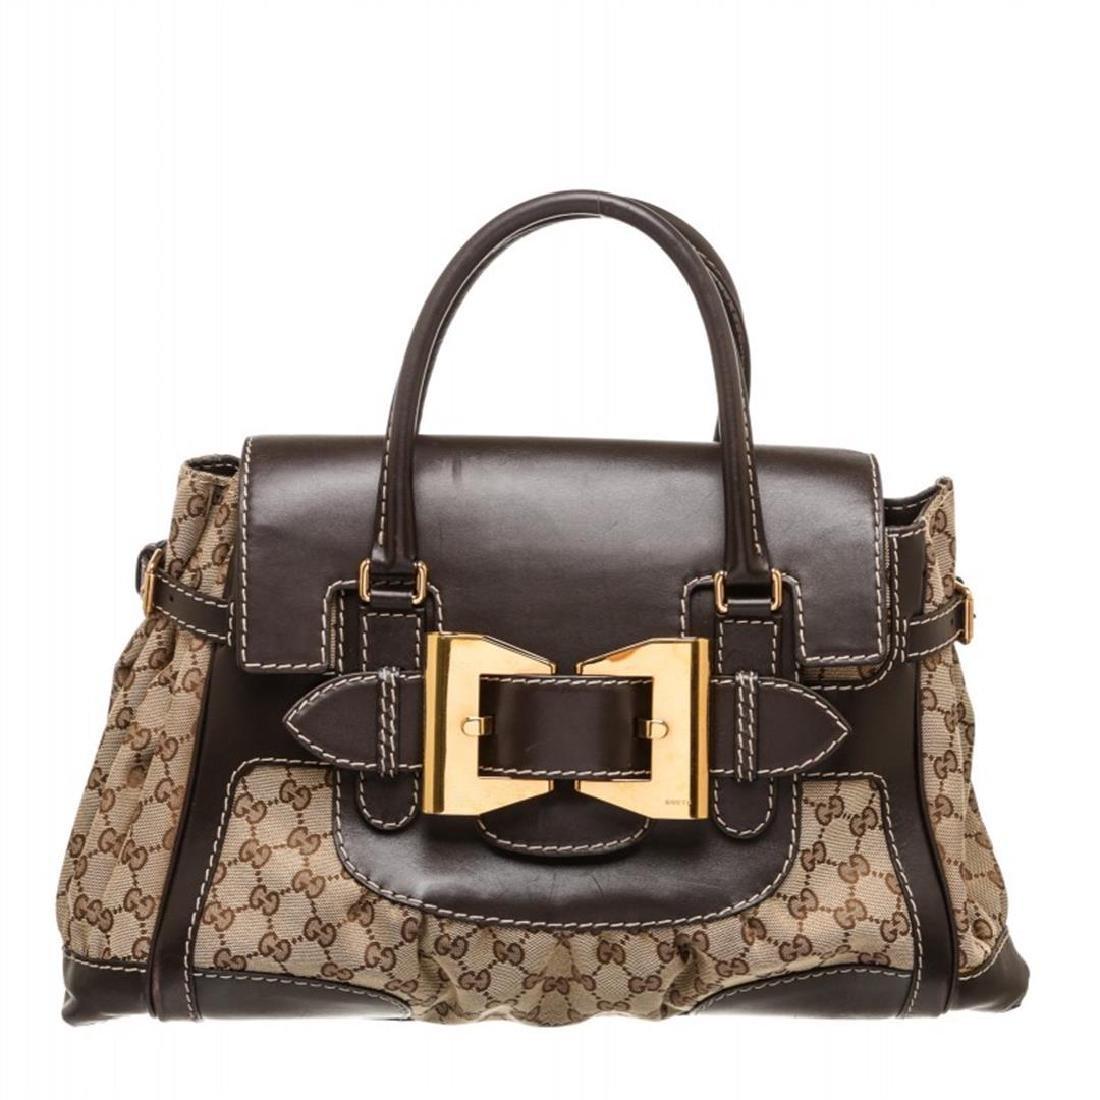 Gucci Beige Canvas Monogram Brown Leather Dialux Queen